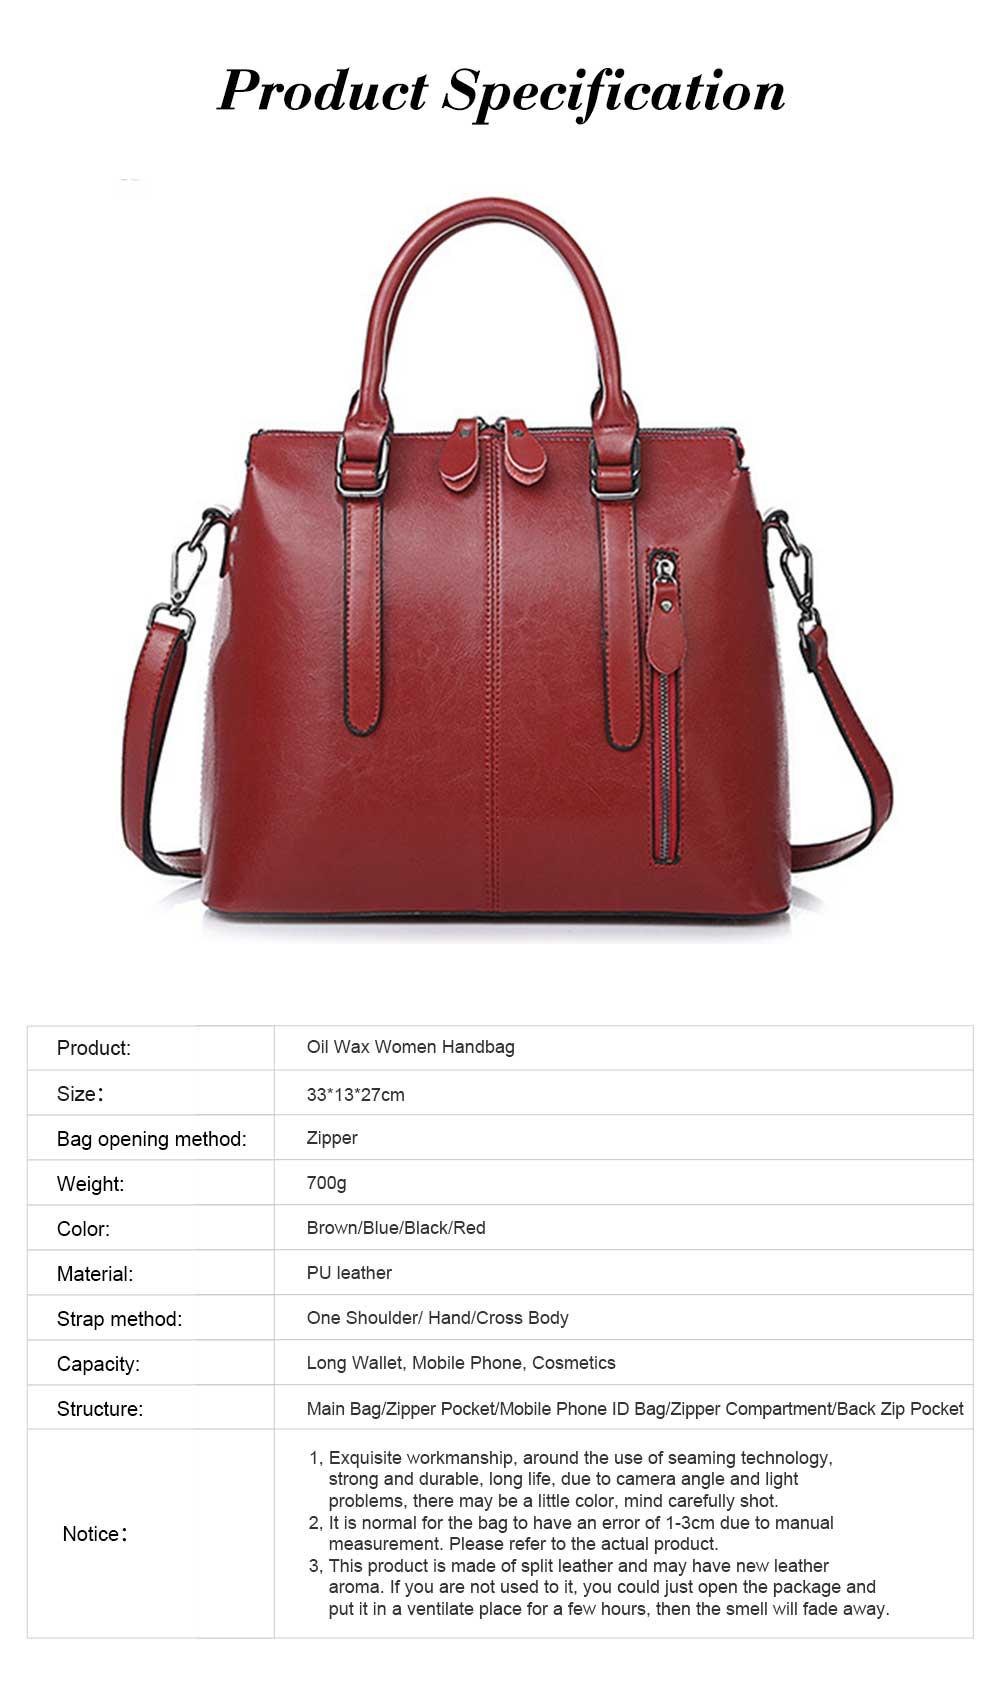 Oil Wax Leather Handbags With Adjustable Shoulder Strap, Fashion Ladies Portable Slung Shoulder Bag 7